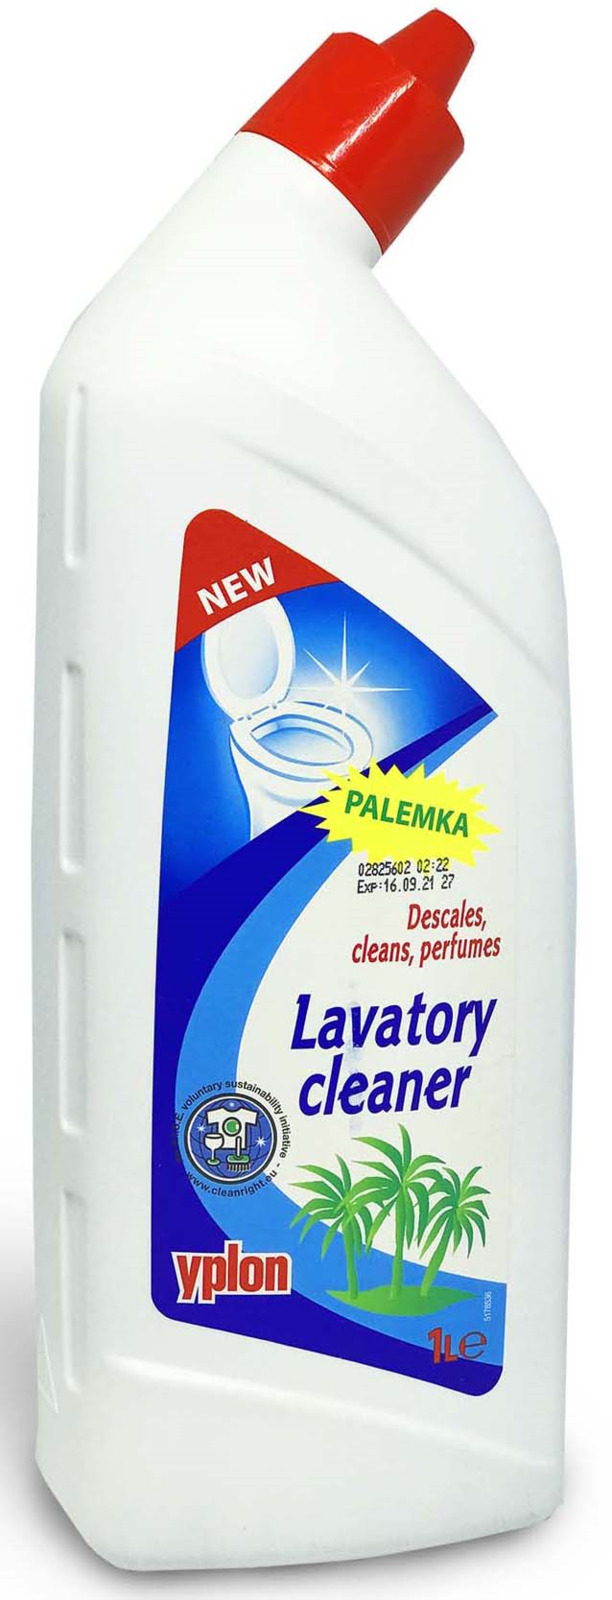 Гель для чистки унитаза Yplon Lavatory Сleaner, 1 л шампунь для чистки ковров yplon 1 л